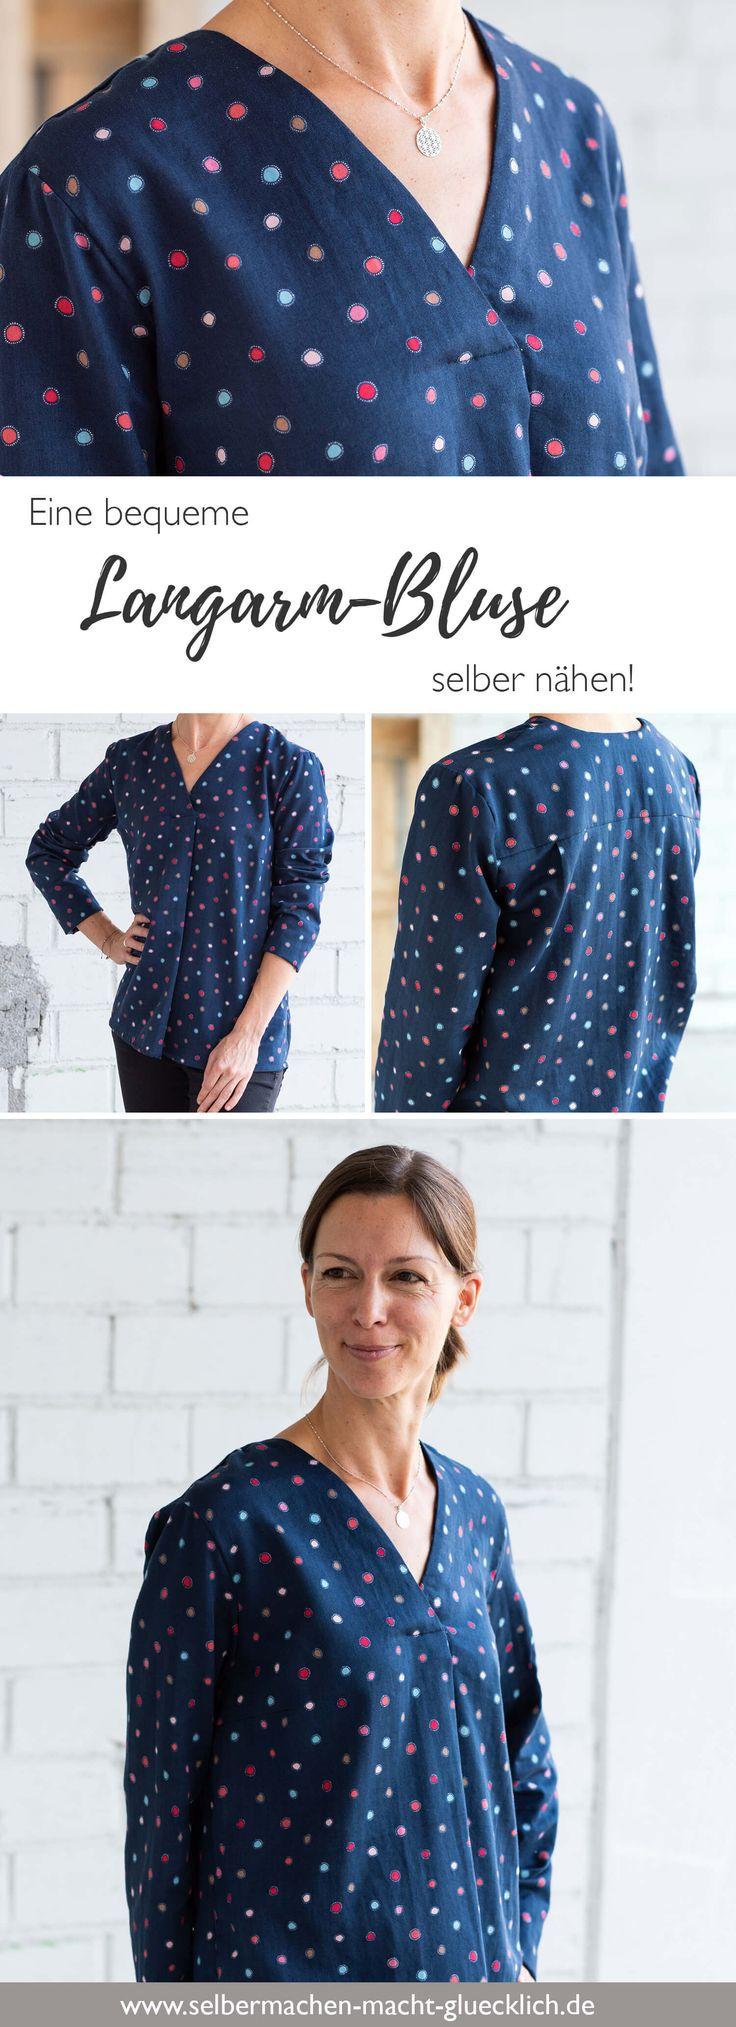 Näh-Blog: Eine bequeme Langarm-Bluse selber nähen!